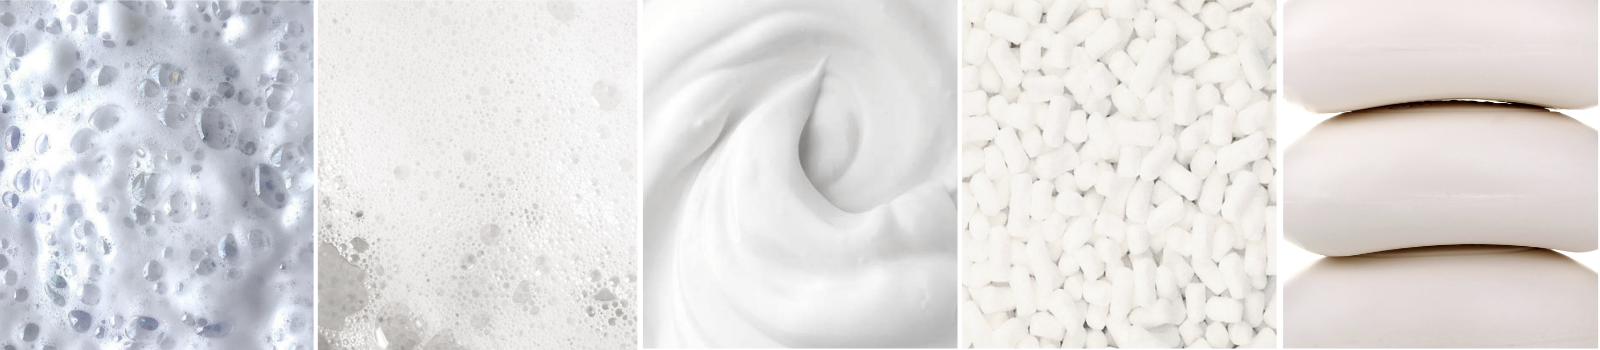 Twincraft Skincare Cosmoprof Landing Page Image